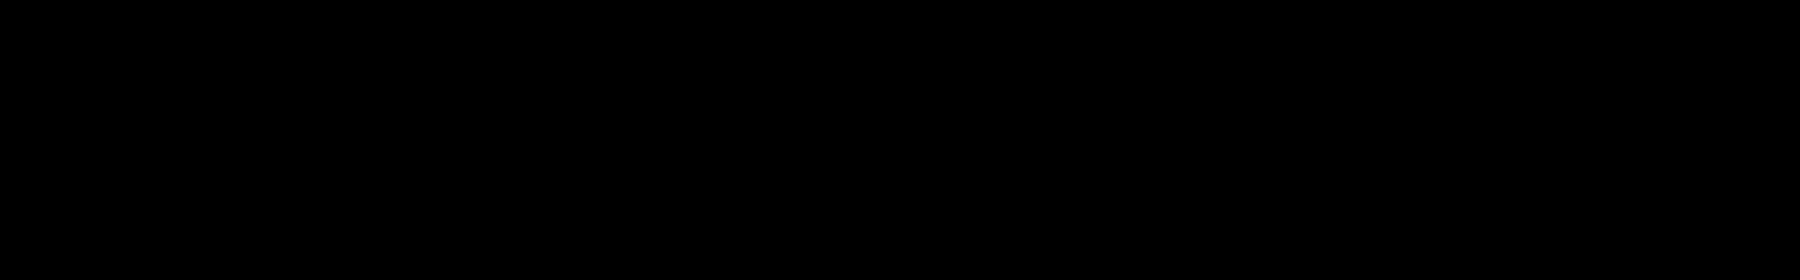 Apolo Melodies - Vocals & Loops audio waveform